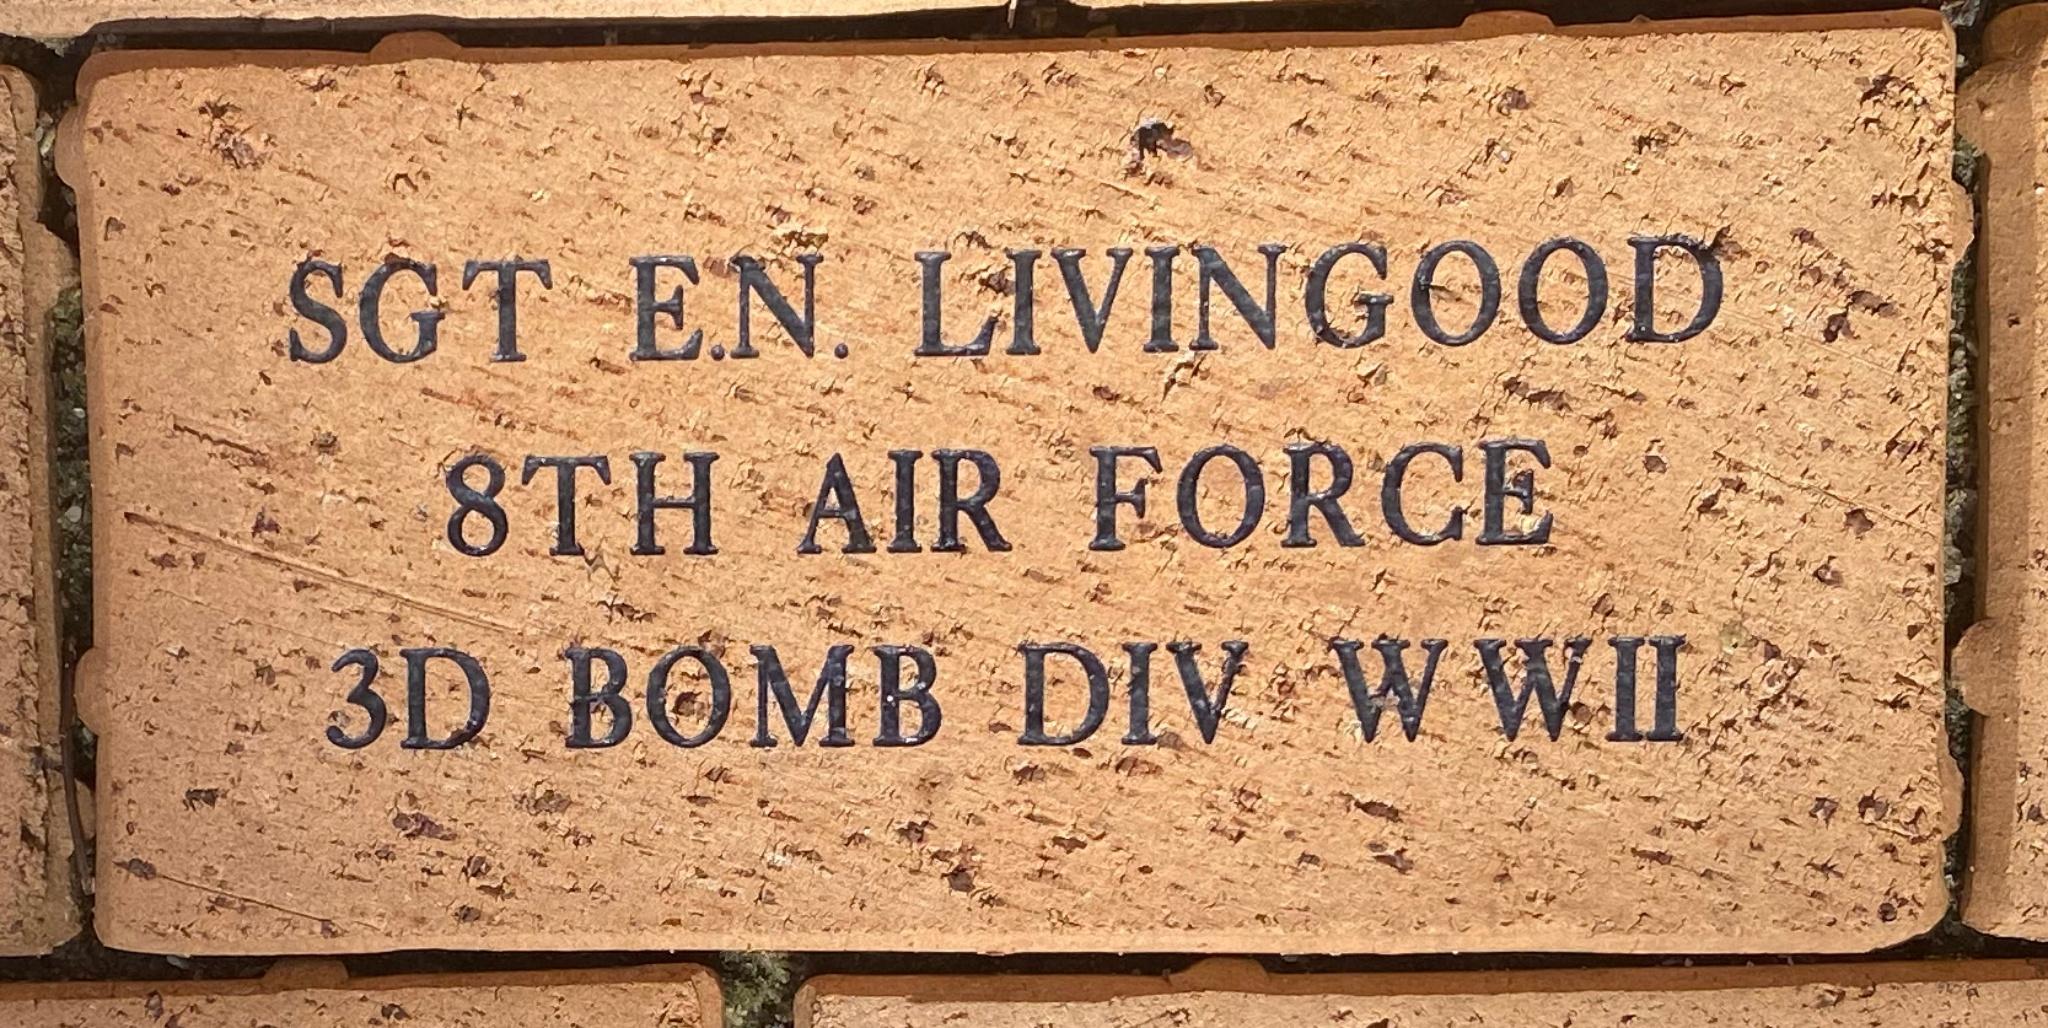 SGT E.N. LIVINGOOD 8TH AIR FORCE 3D BOMB DIV WWII